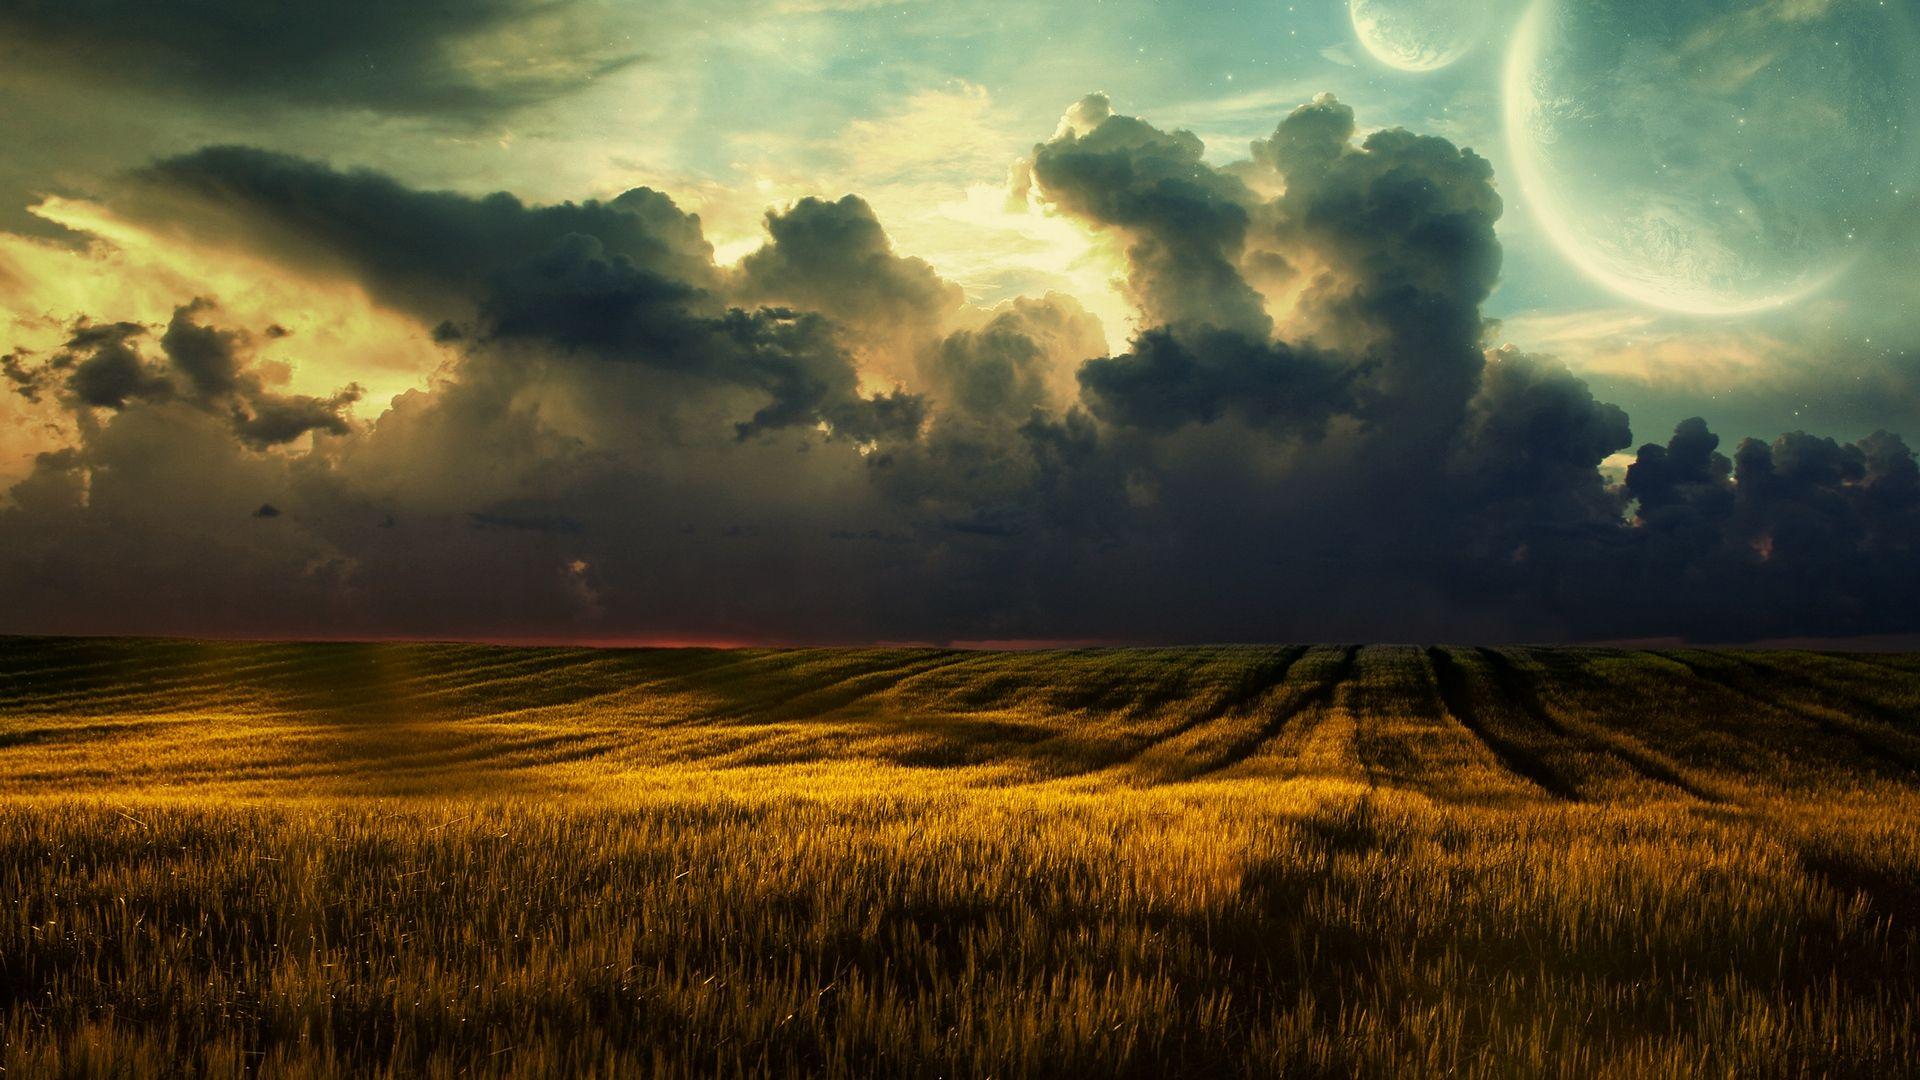 Dark Clouds background picture hd